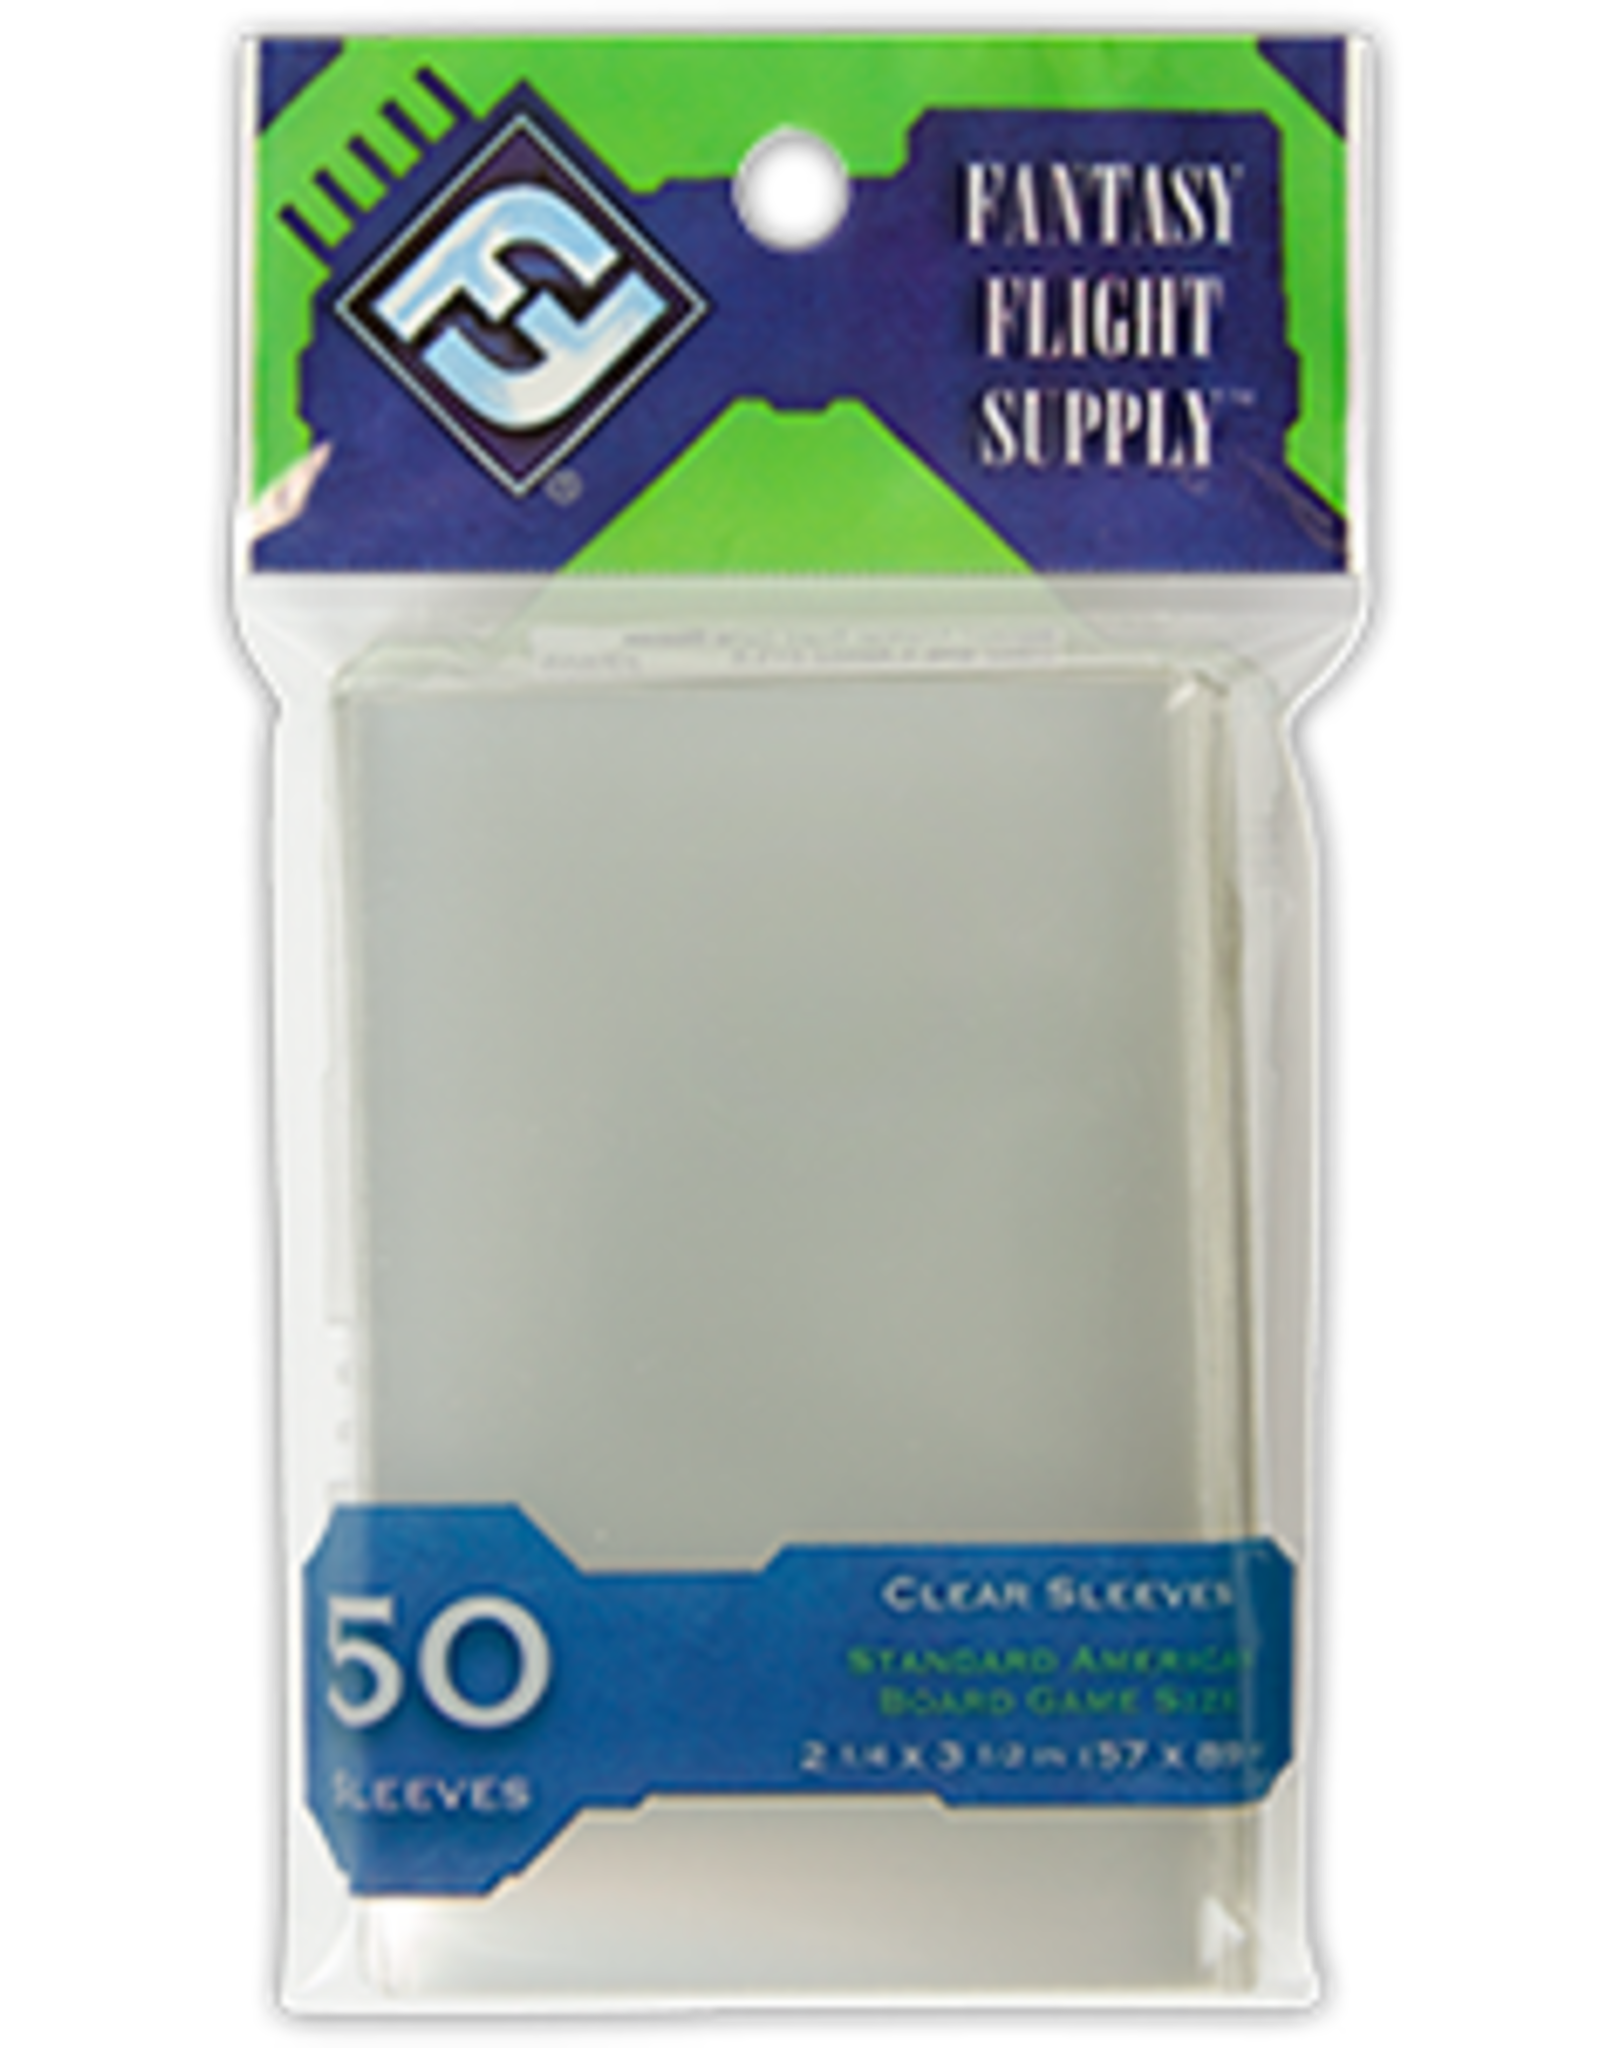 Fantasy Flight Standard American Board Game Sleeves (Green)